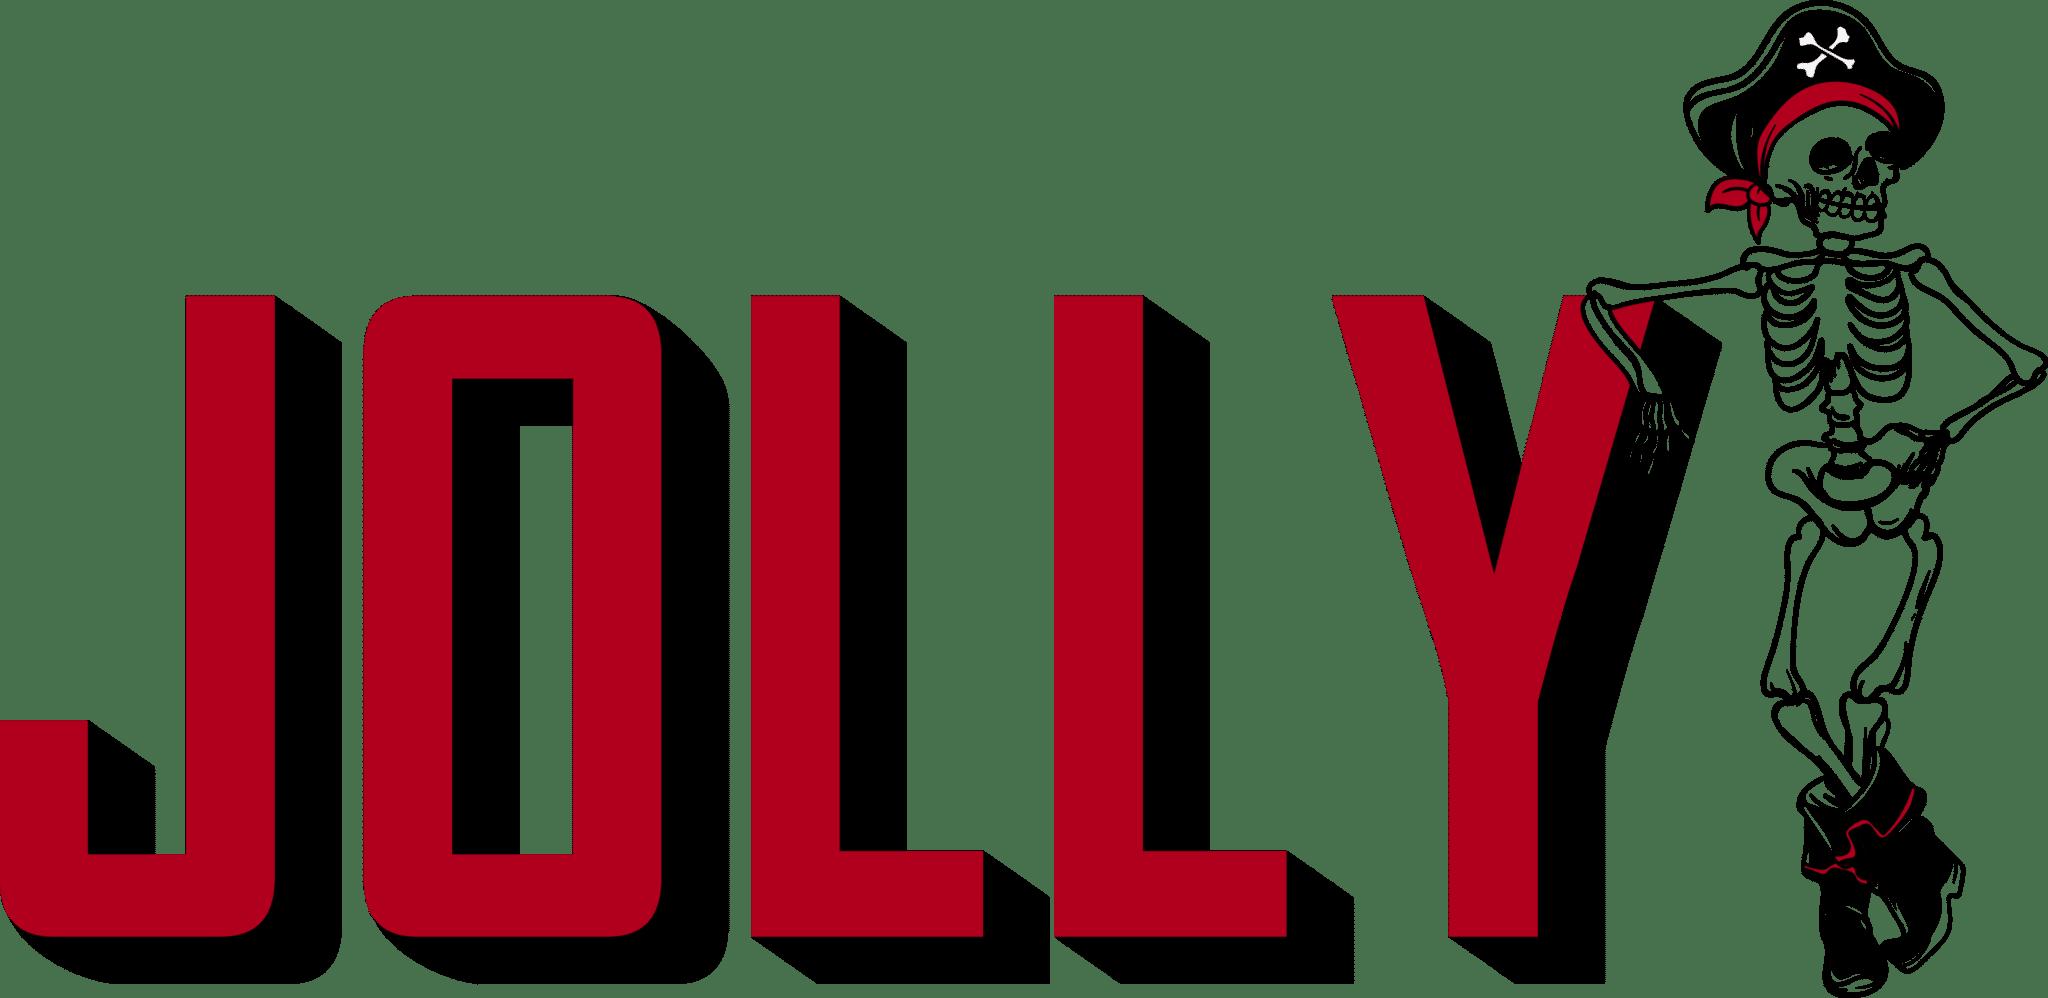 jolly seo 2021